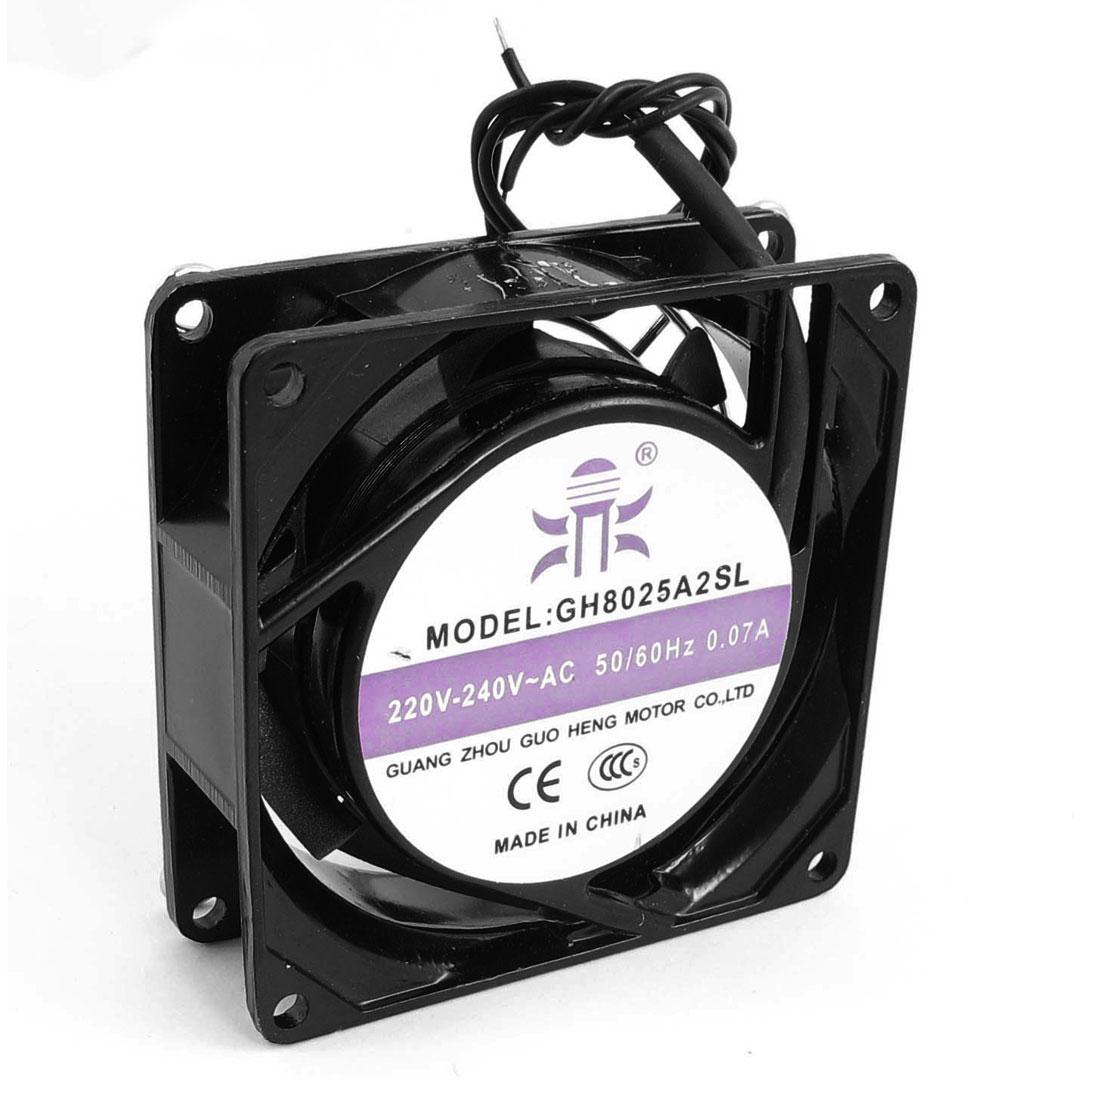 AC 220V-240V 0.07A 2 Wire Connect Black Metal 7-Flabellum Axial Fan Heatsink 80mm x 25mm